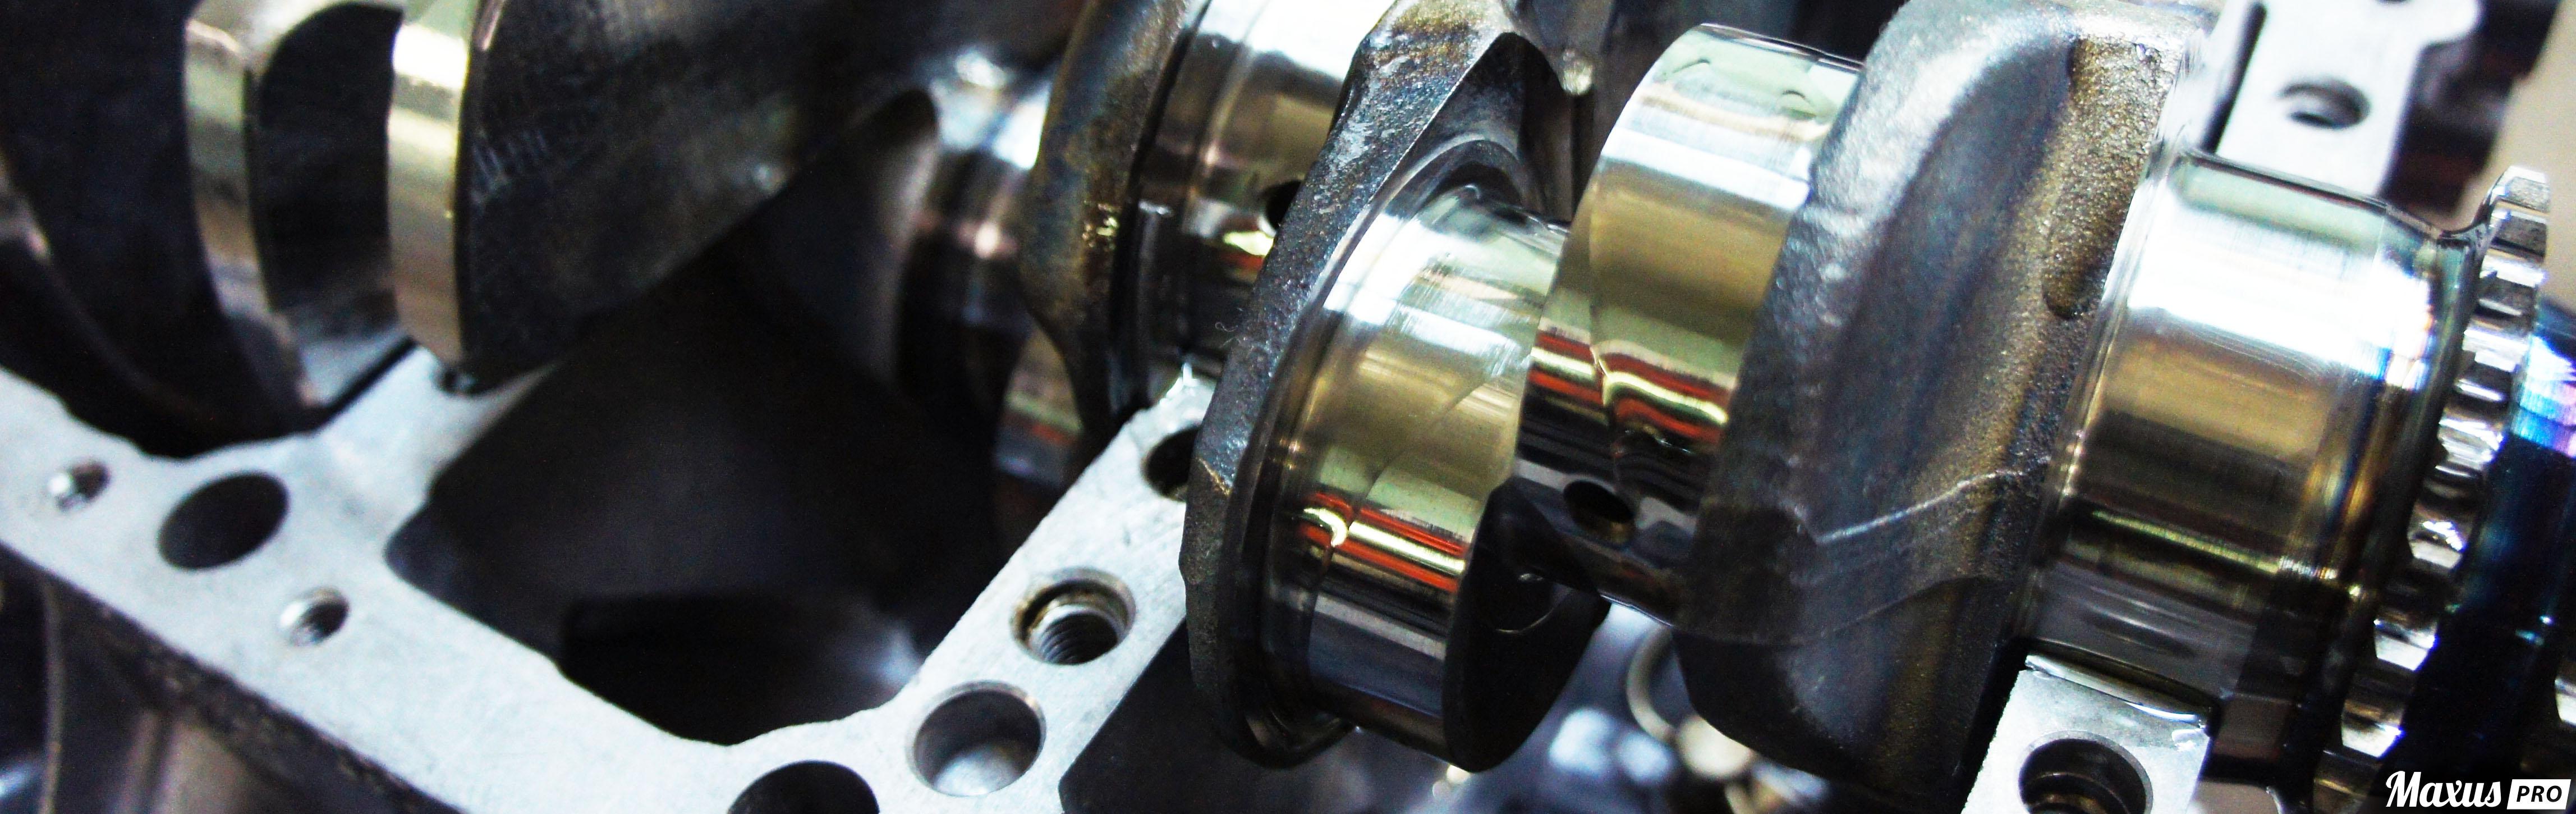 Ремонт двигателя Maxuspro